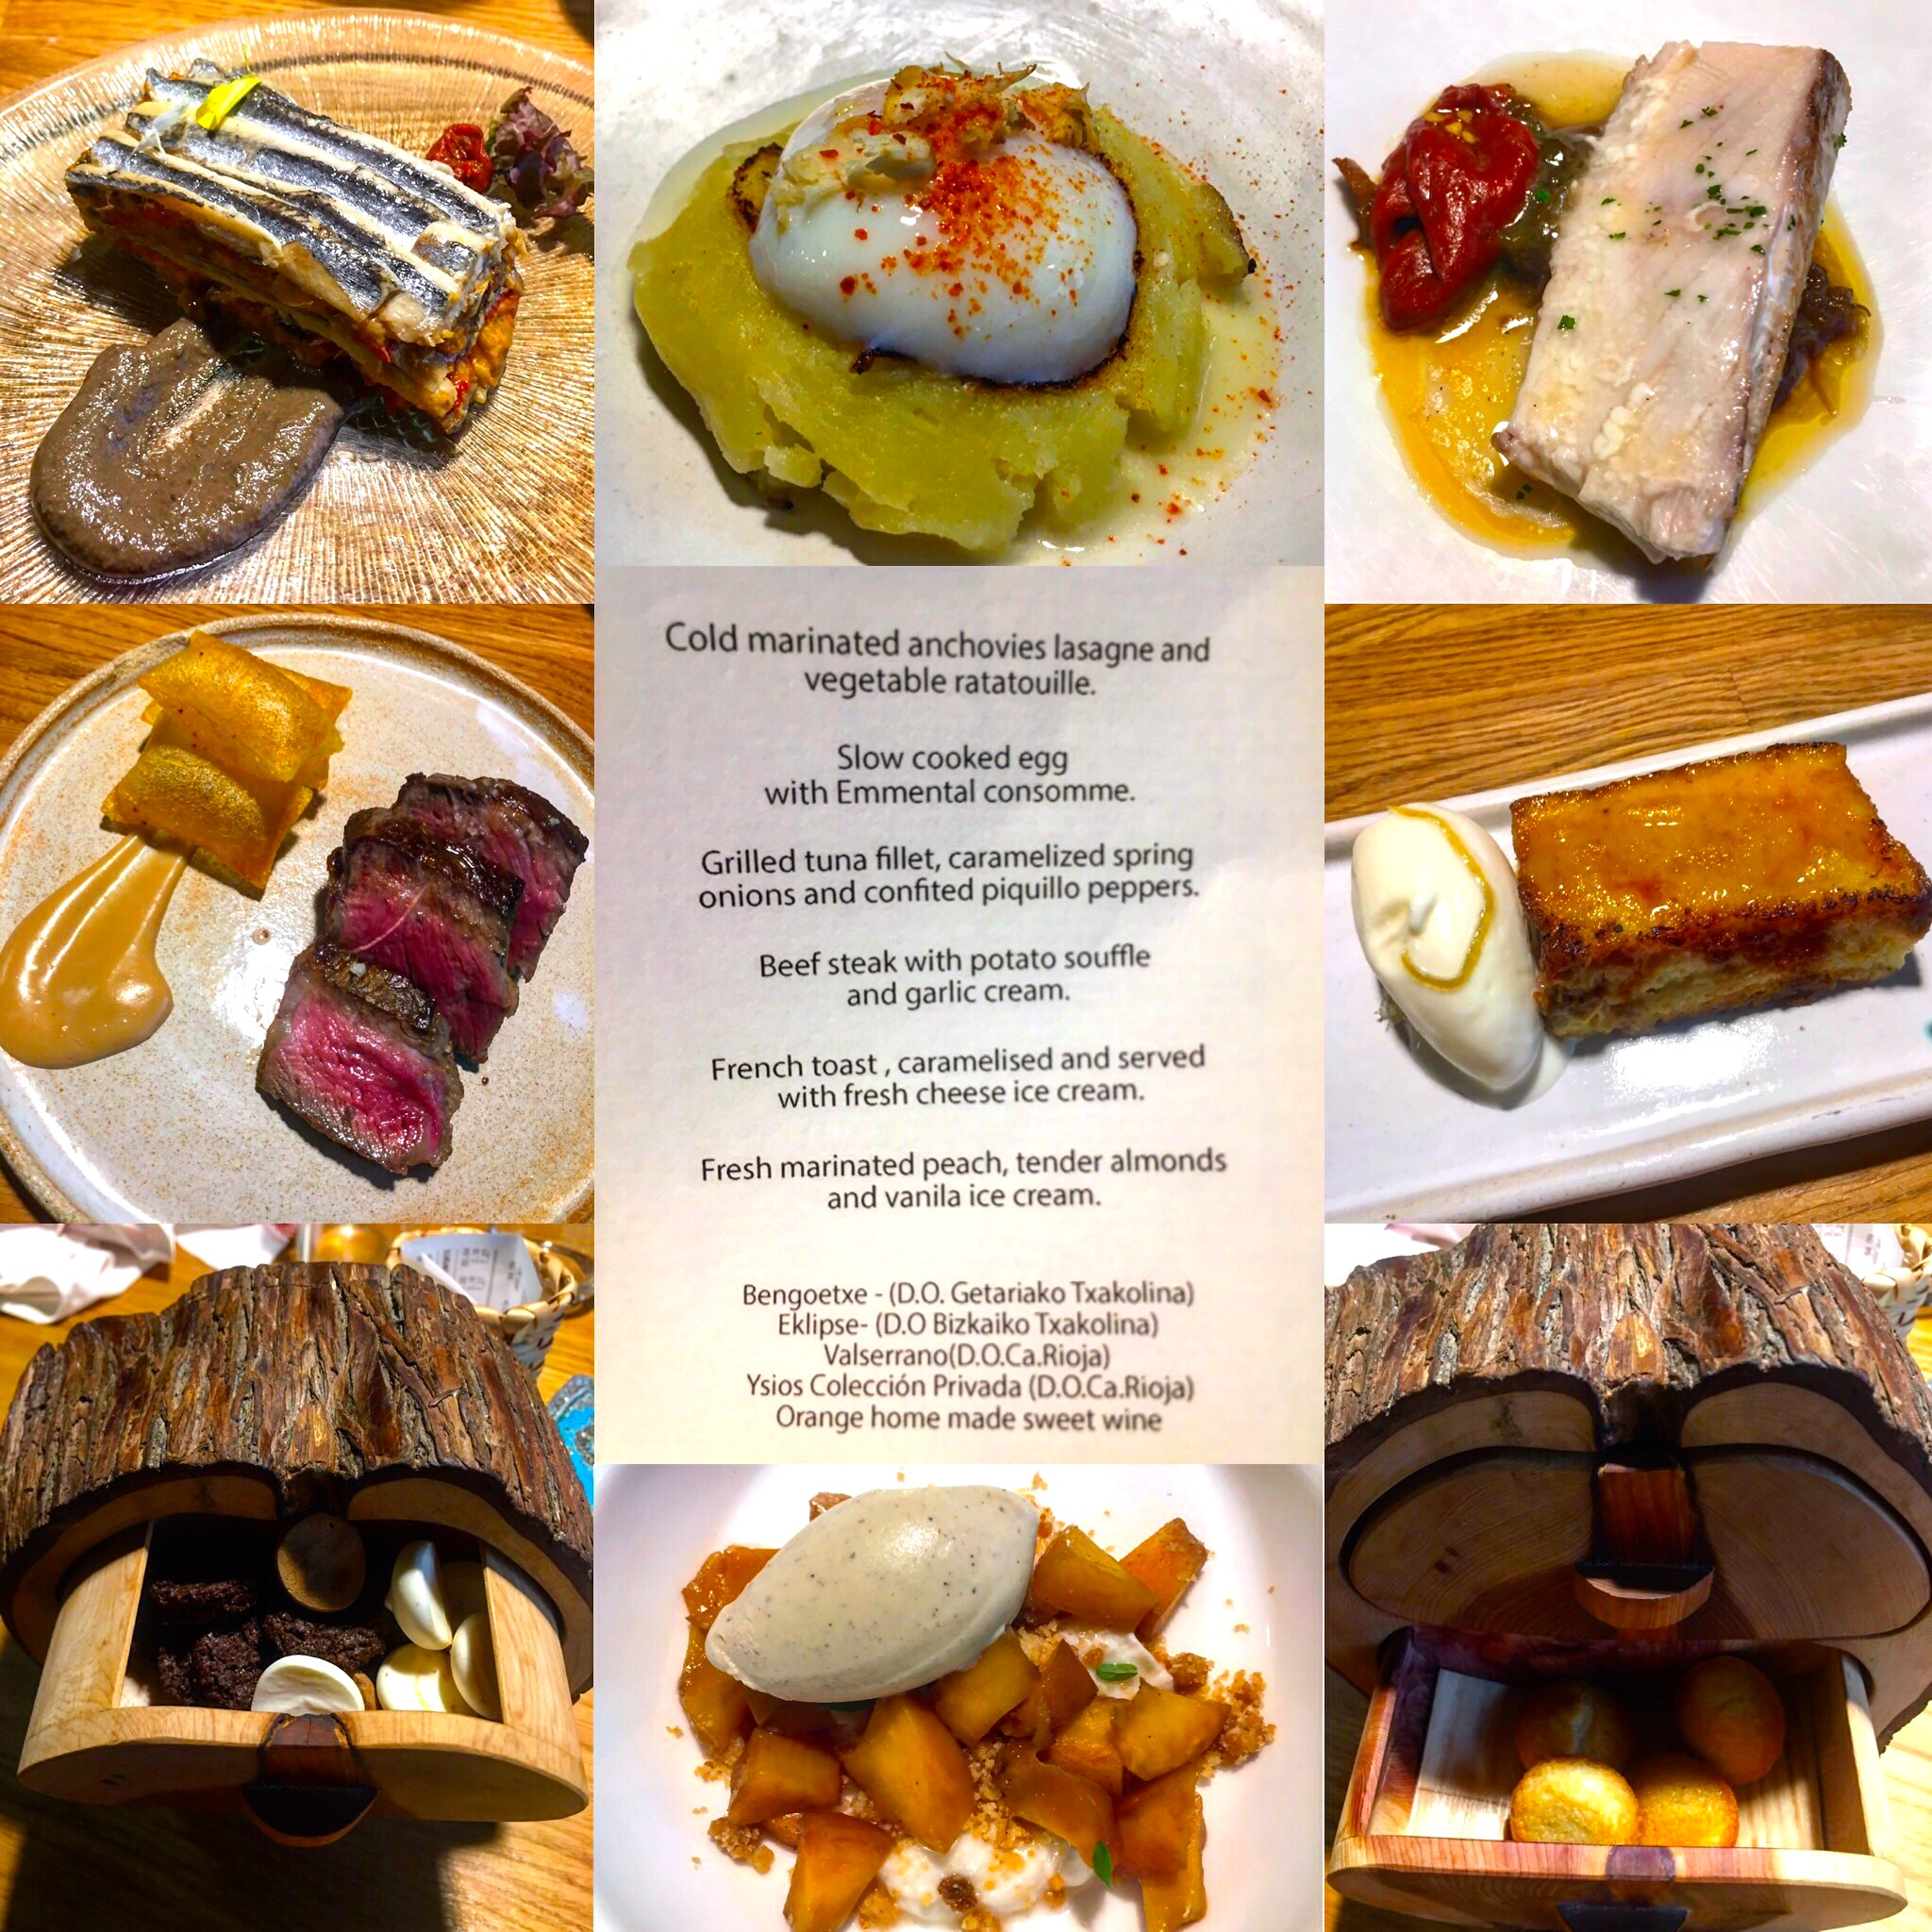 Set menu at Bodegon Alejandro, one of San Sebastian's michelin star restaurants